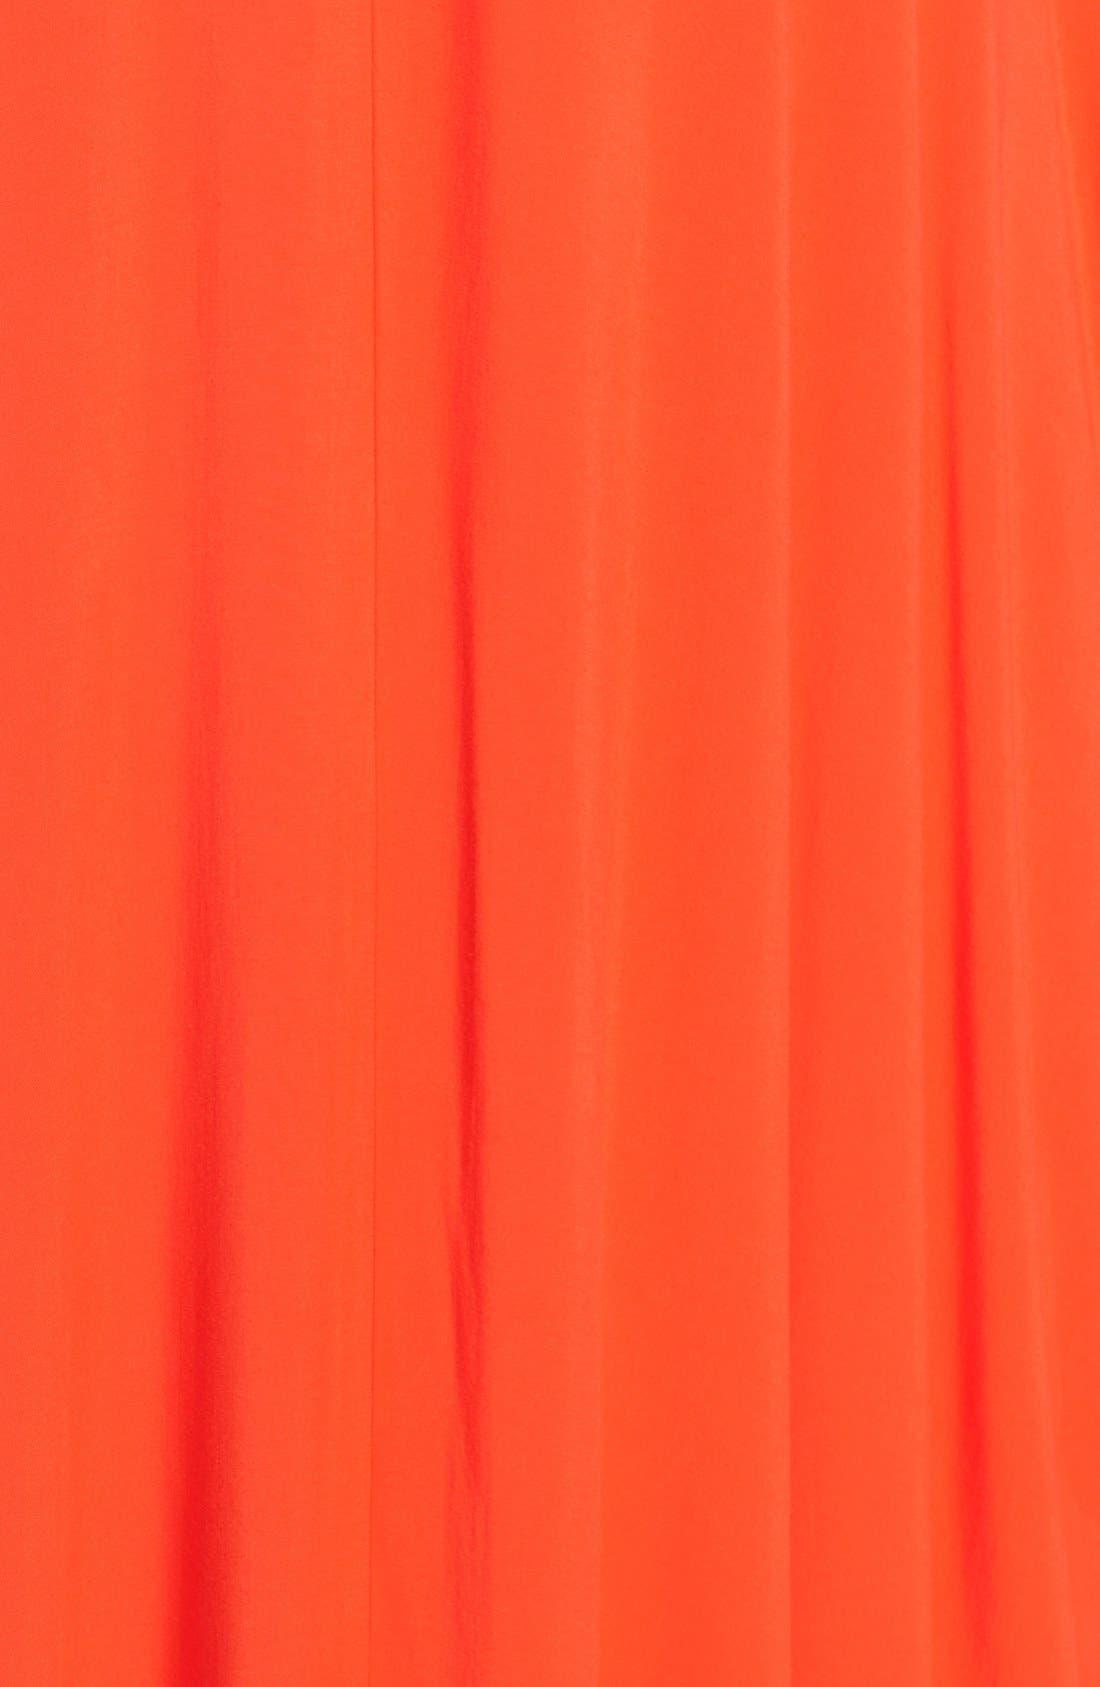 Cover-Up Maxi Dress,                             Alternate thumbnail 47, color,